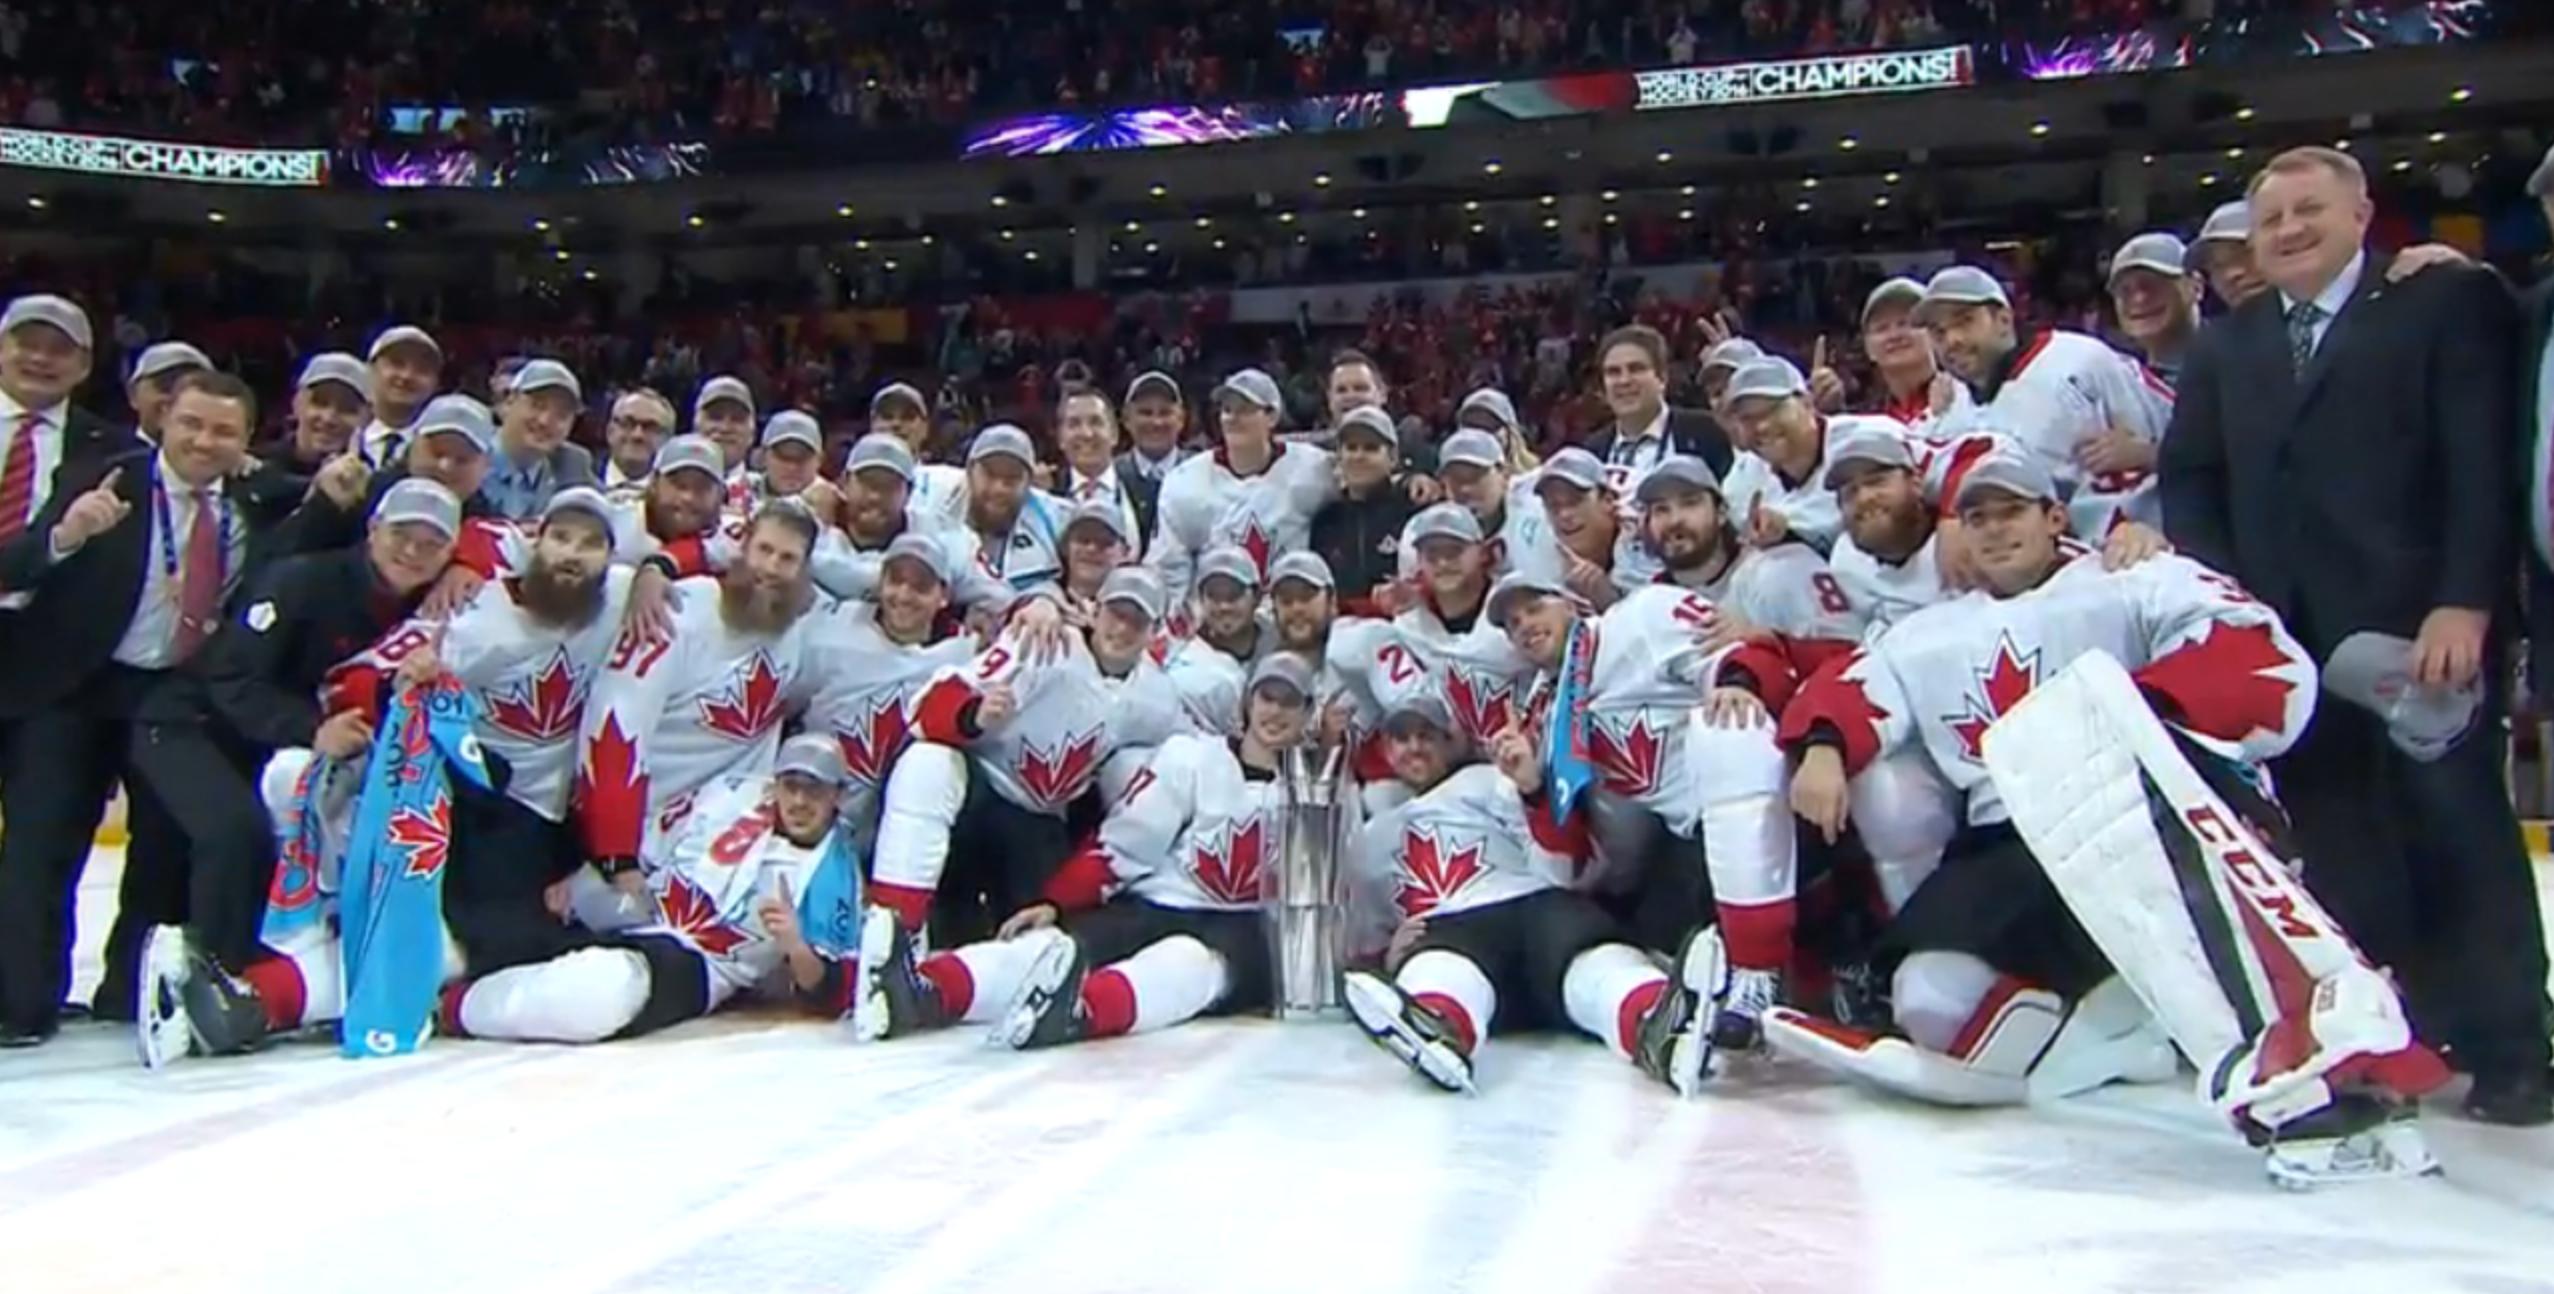 c63fd801176 Team Canada World Cup of Hockey Champions 2016